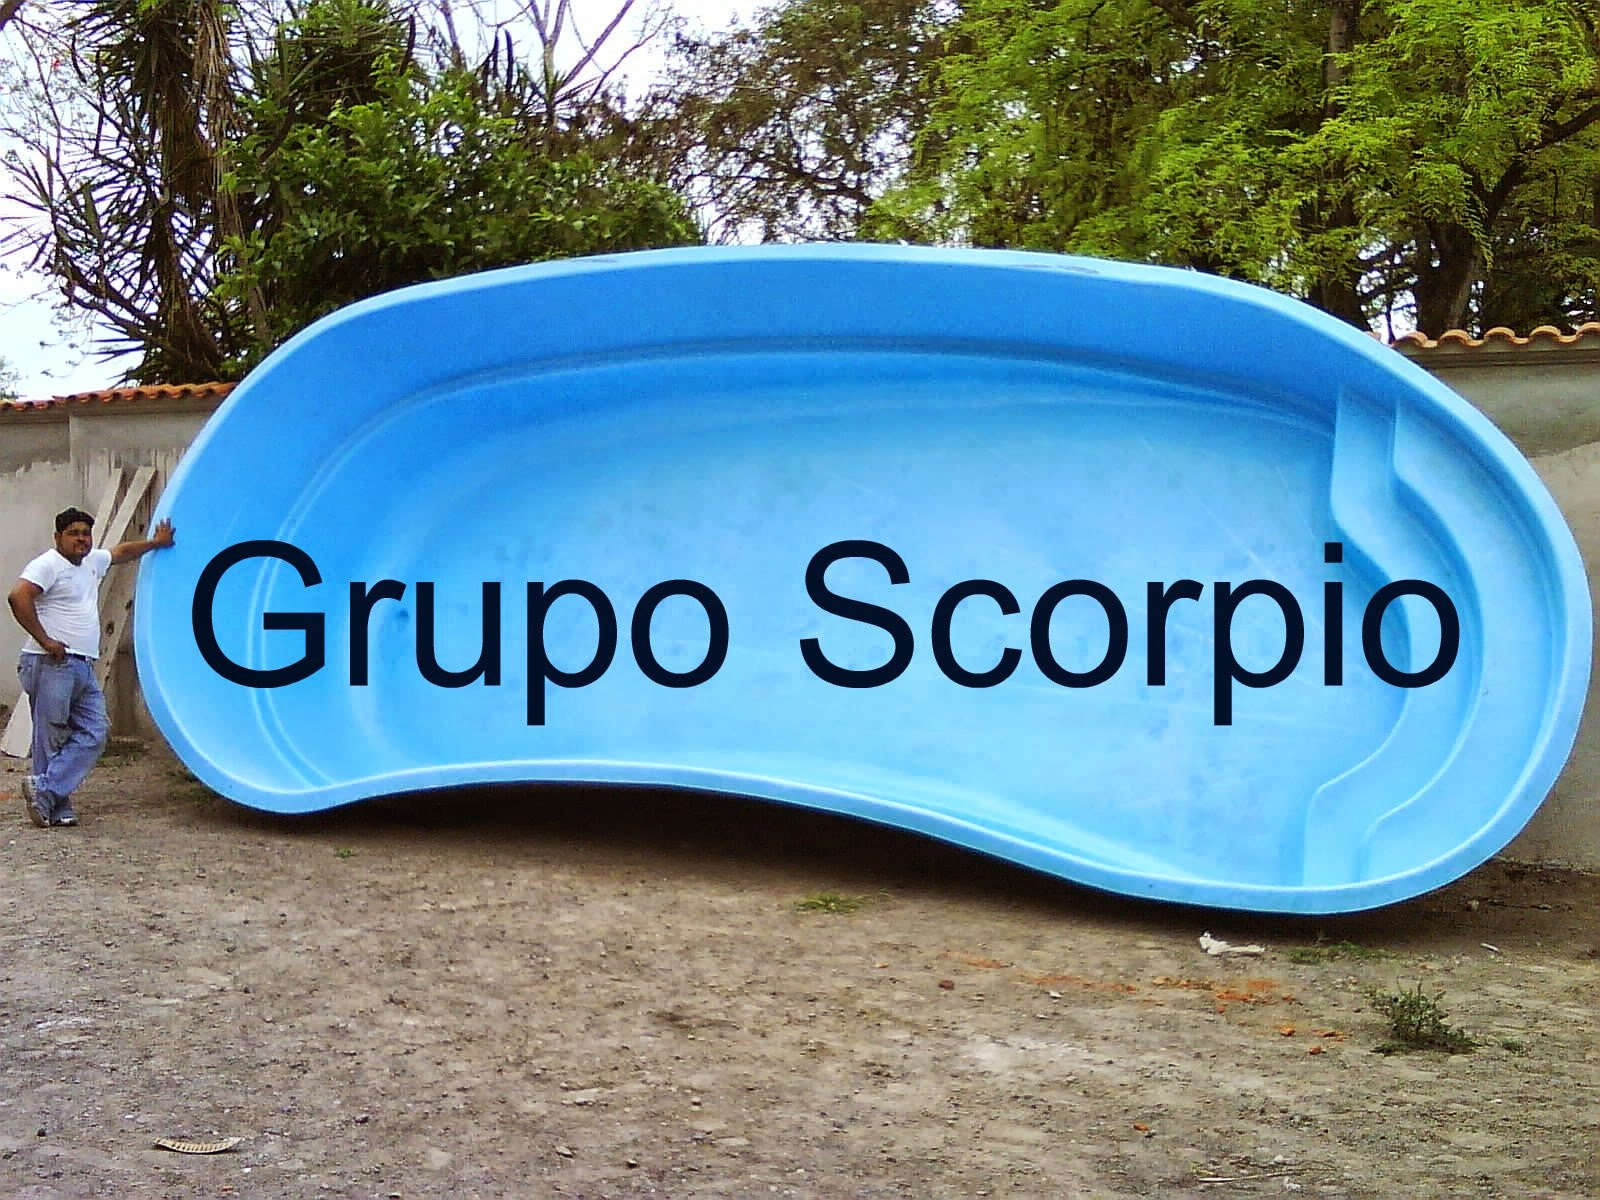 Grupo scorpio albercas y toboganes for Albercas portatiles en hermosillo